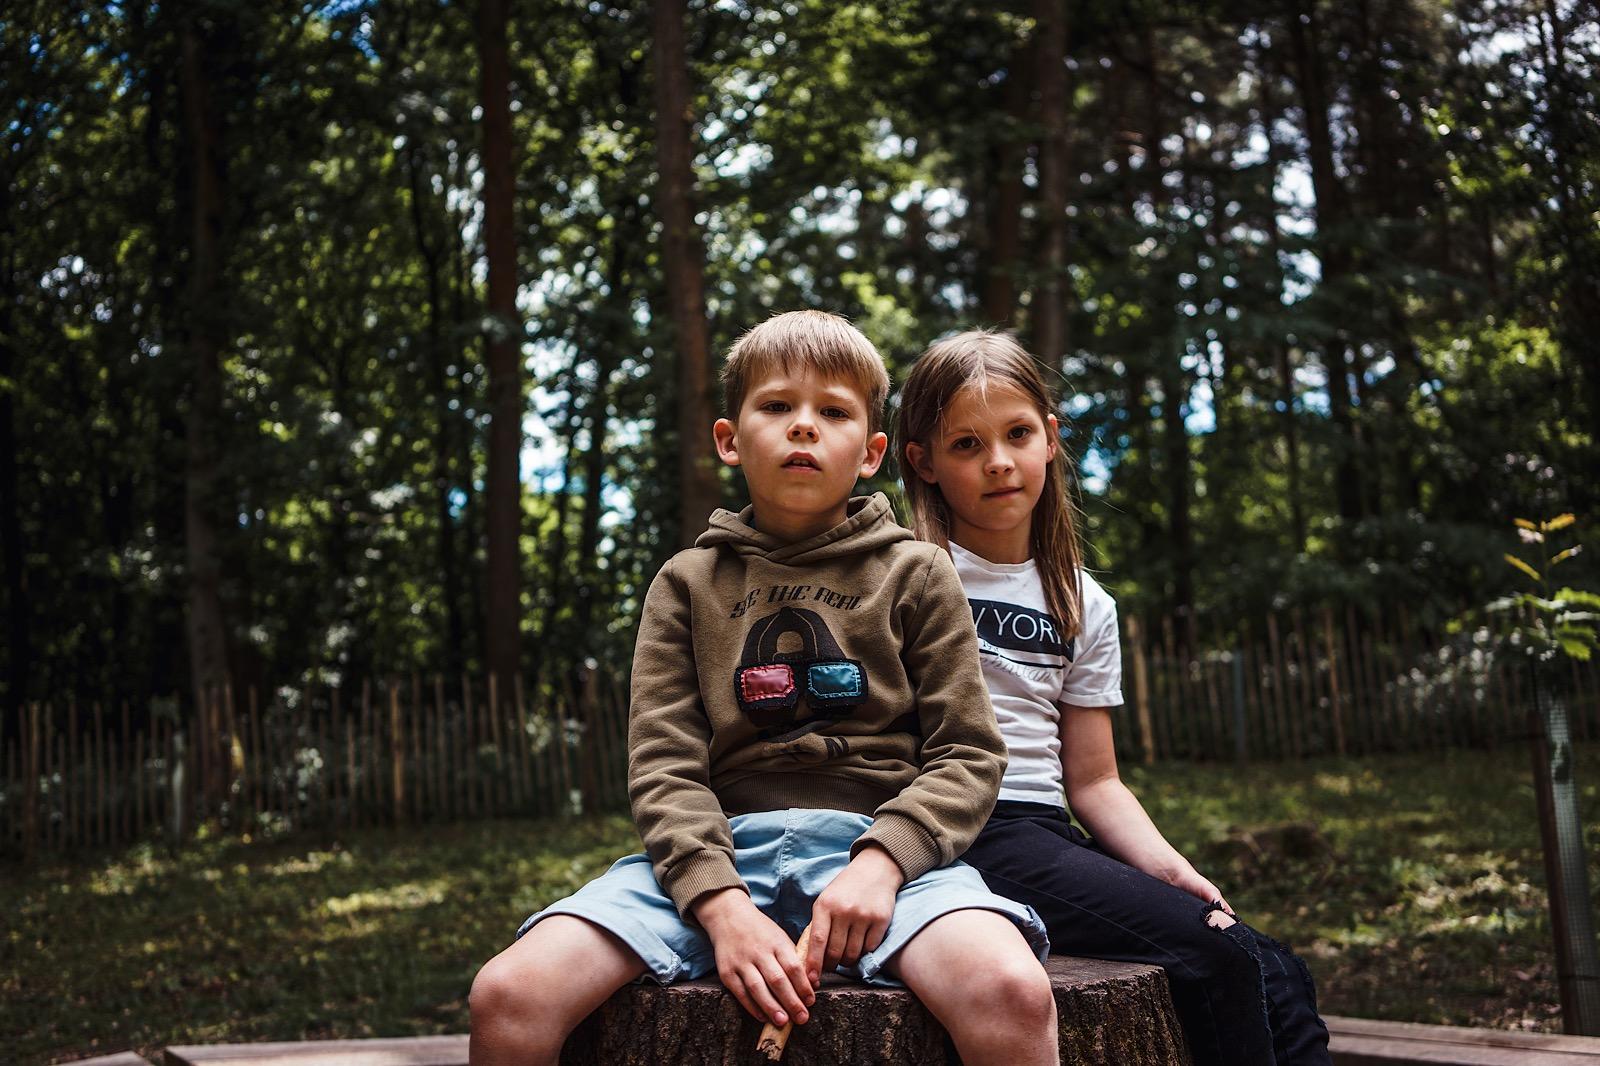 boy and girl sat on tree stump